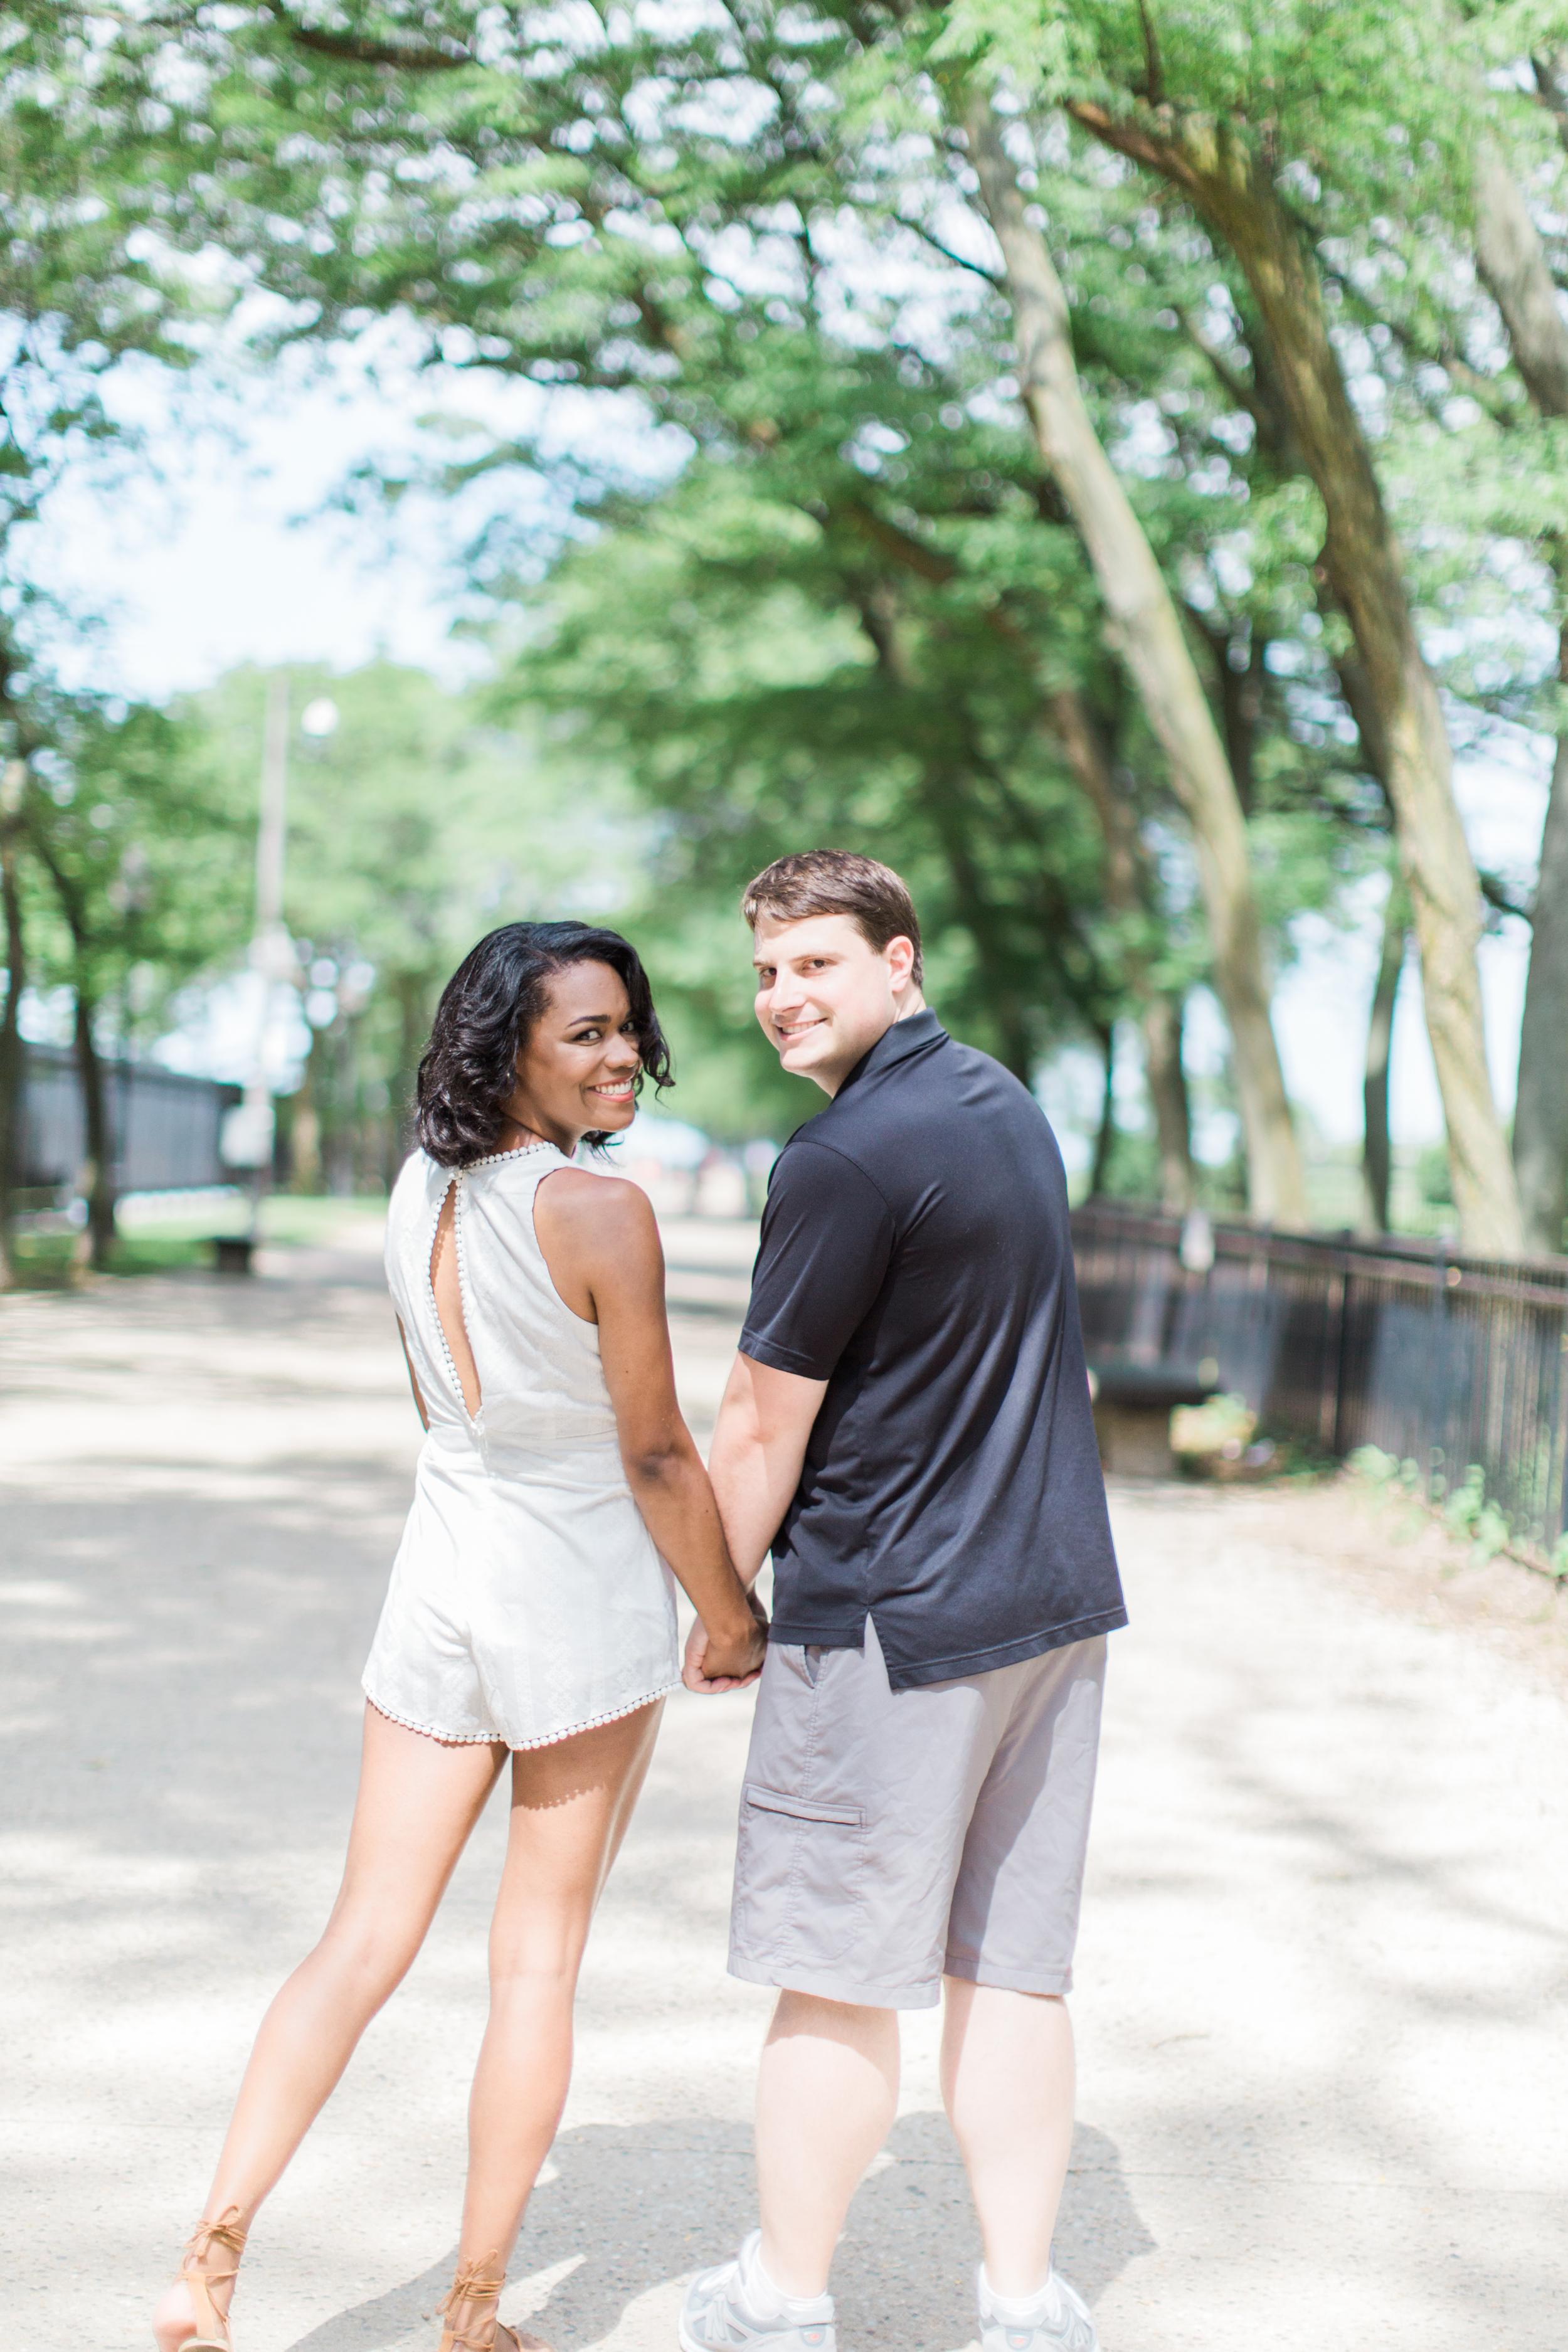 Olive Park Bonphotage Chicago Engagement Session